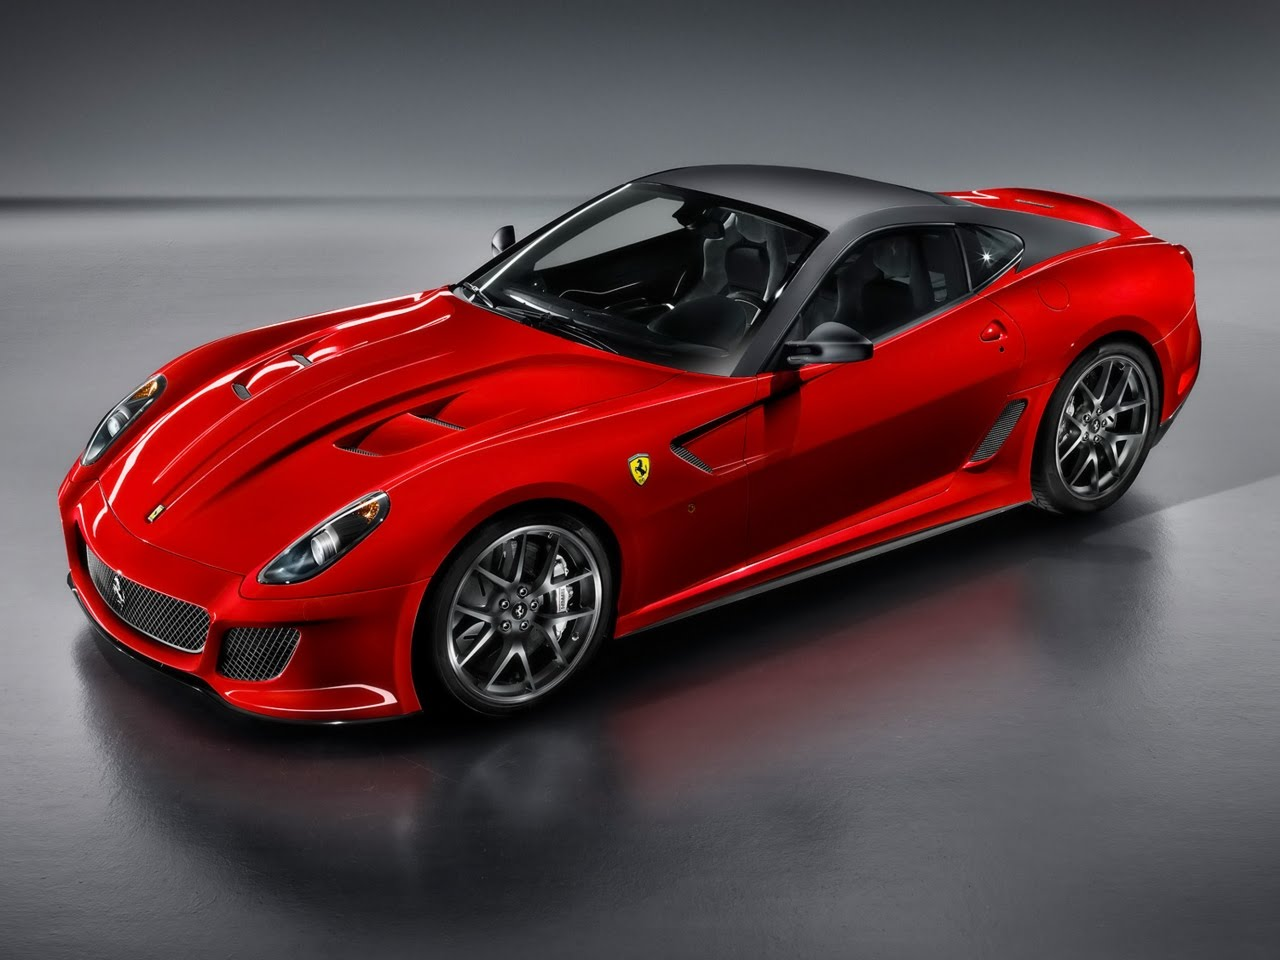 Luxury Car Wallpapers: 2010 Ferrari 599 GTO